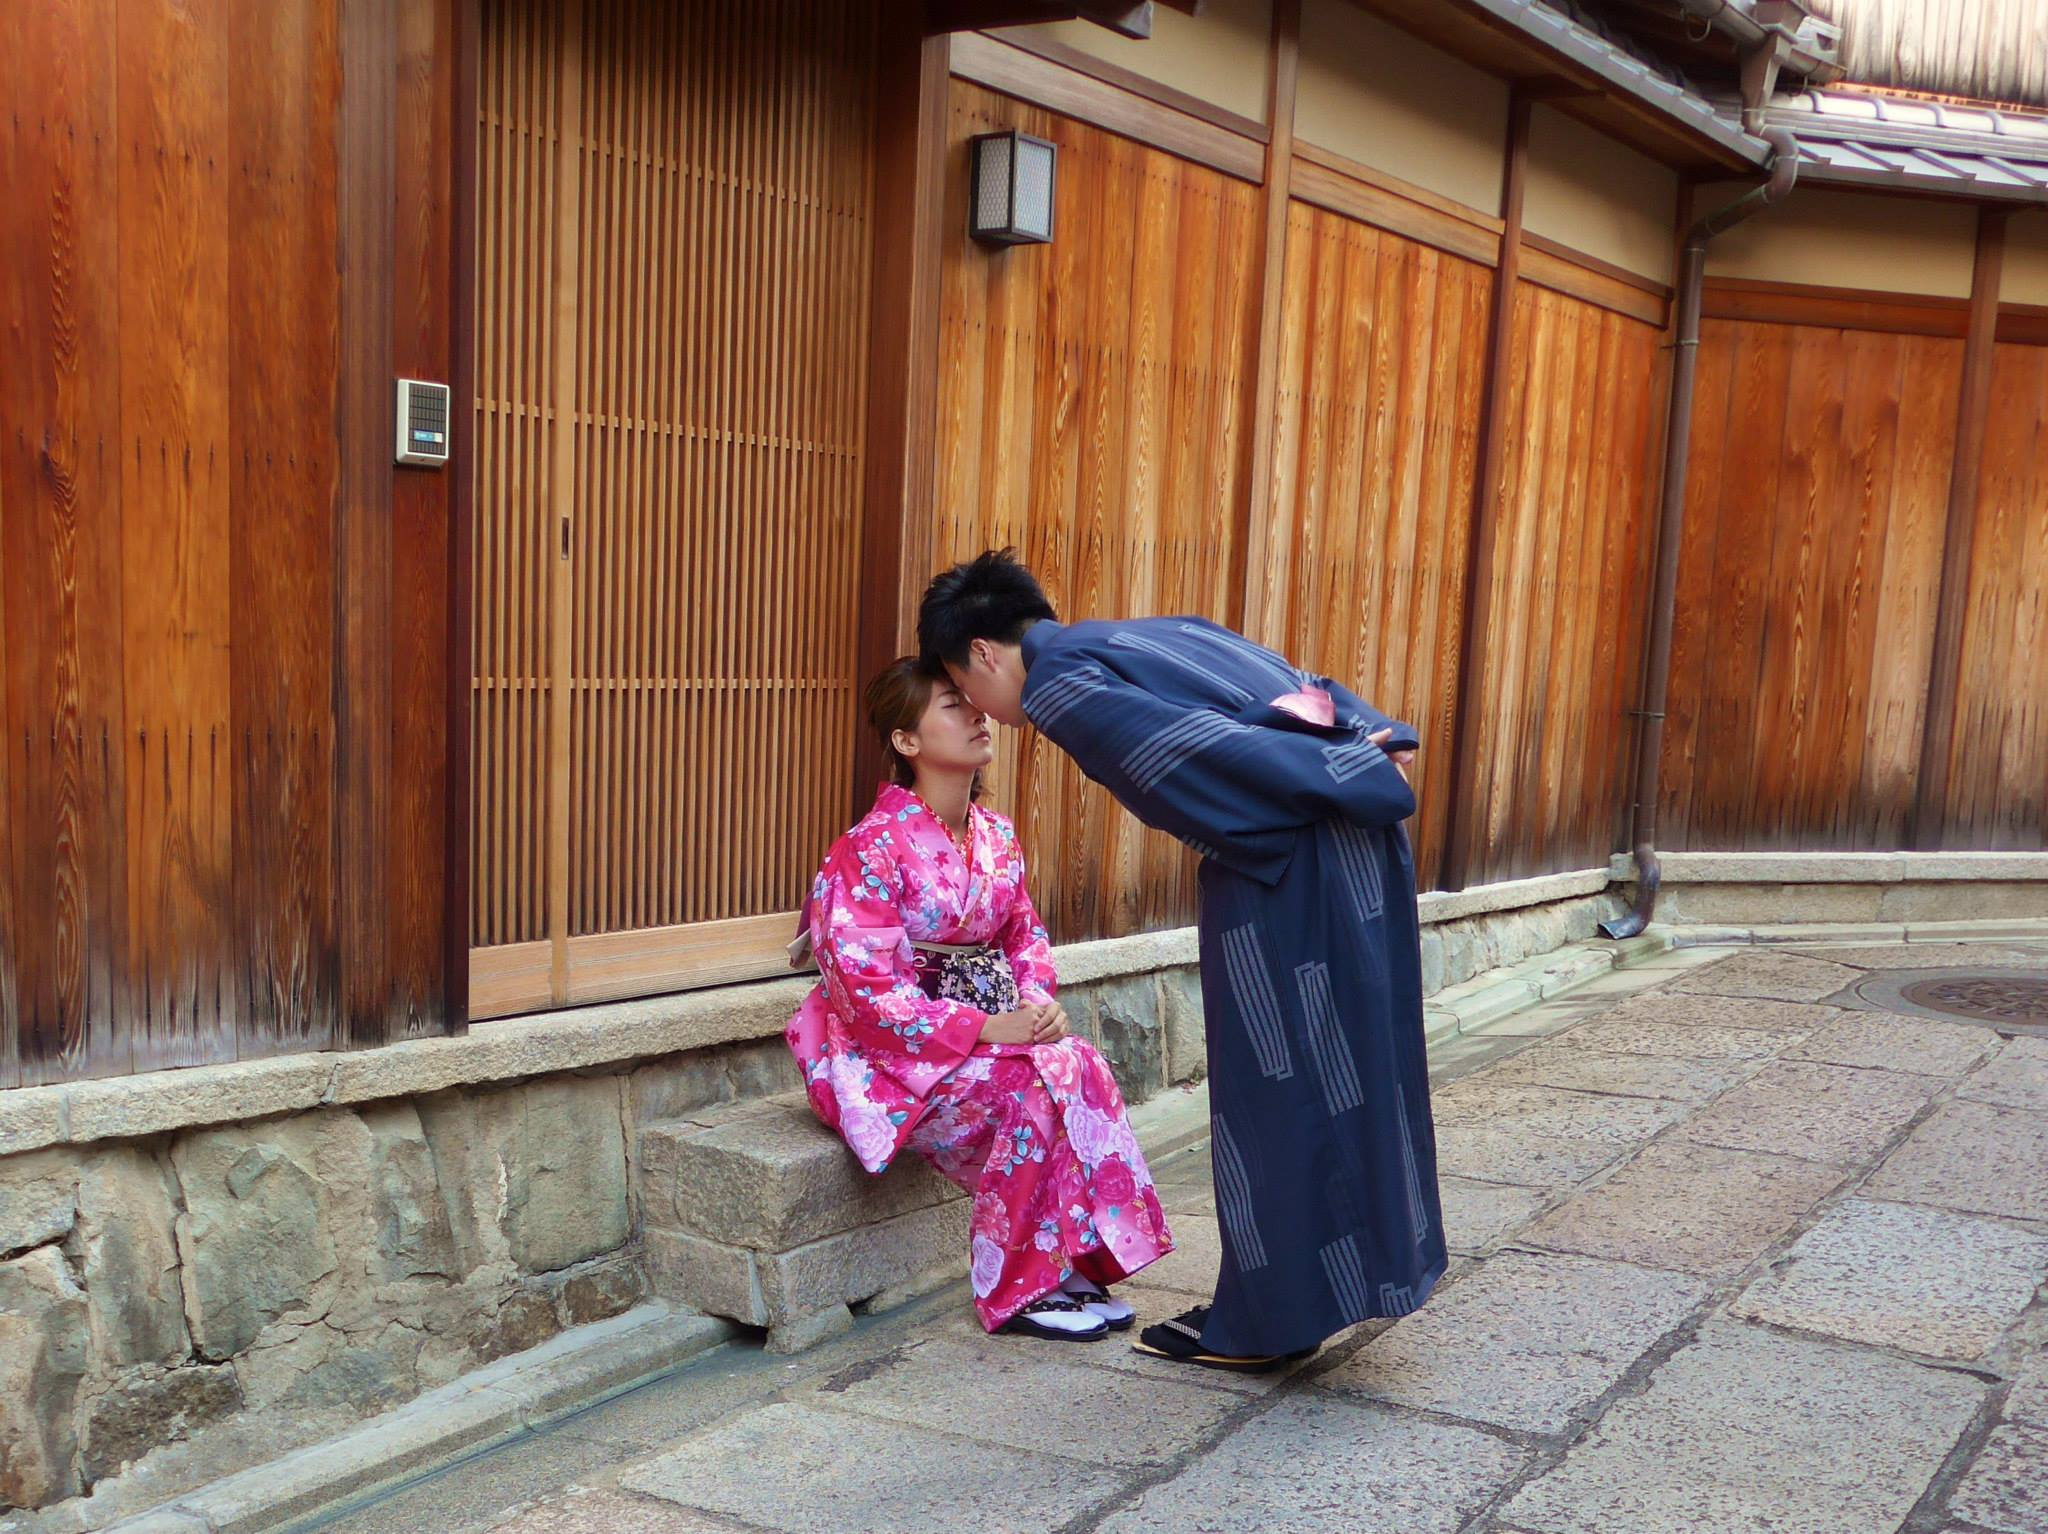 Romantiek in een klein steegje in Kyoto